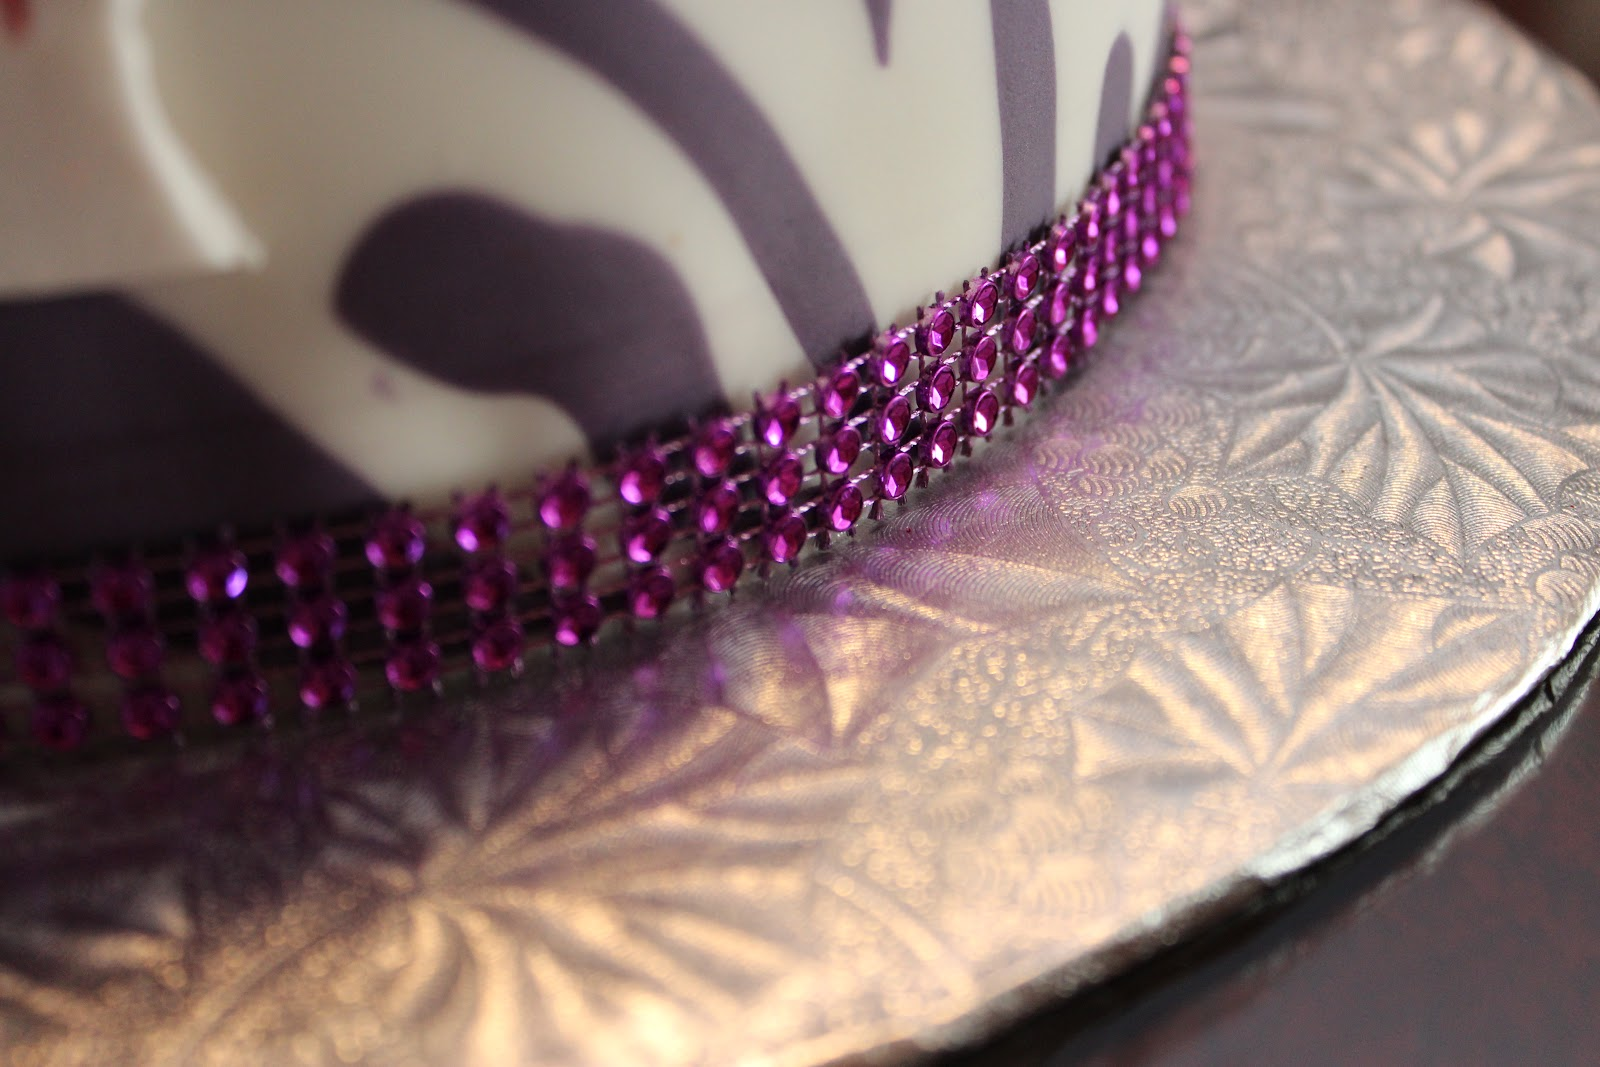 Zebra Cake Recipe Joy Of Baking: Love Dem Goodies: Purple And White Zebra Cake